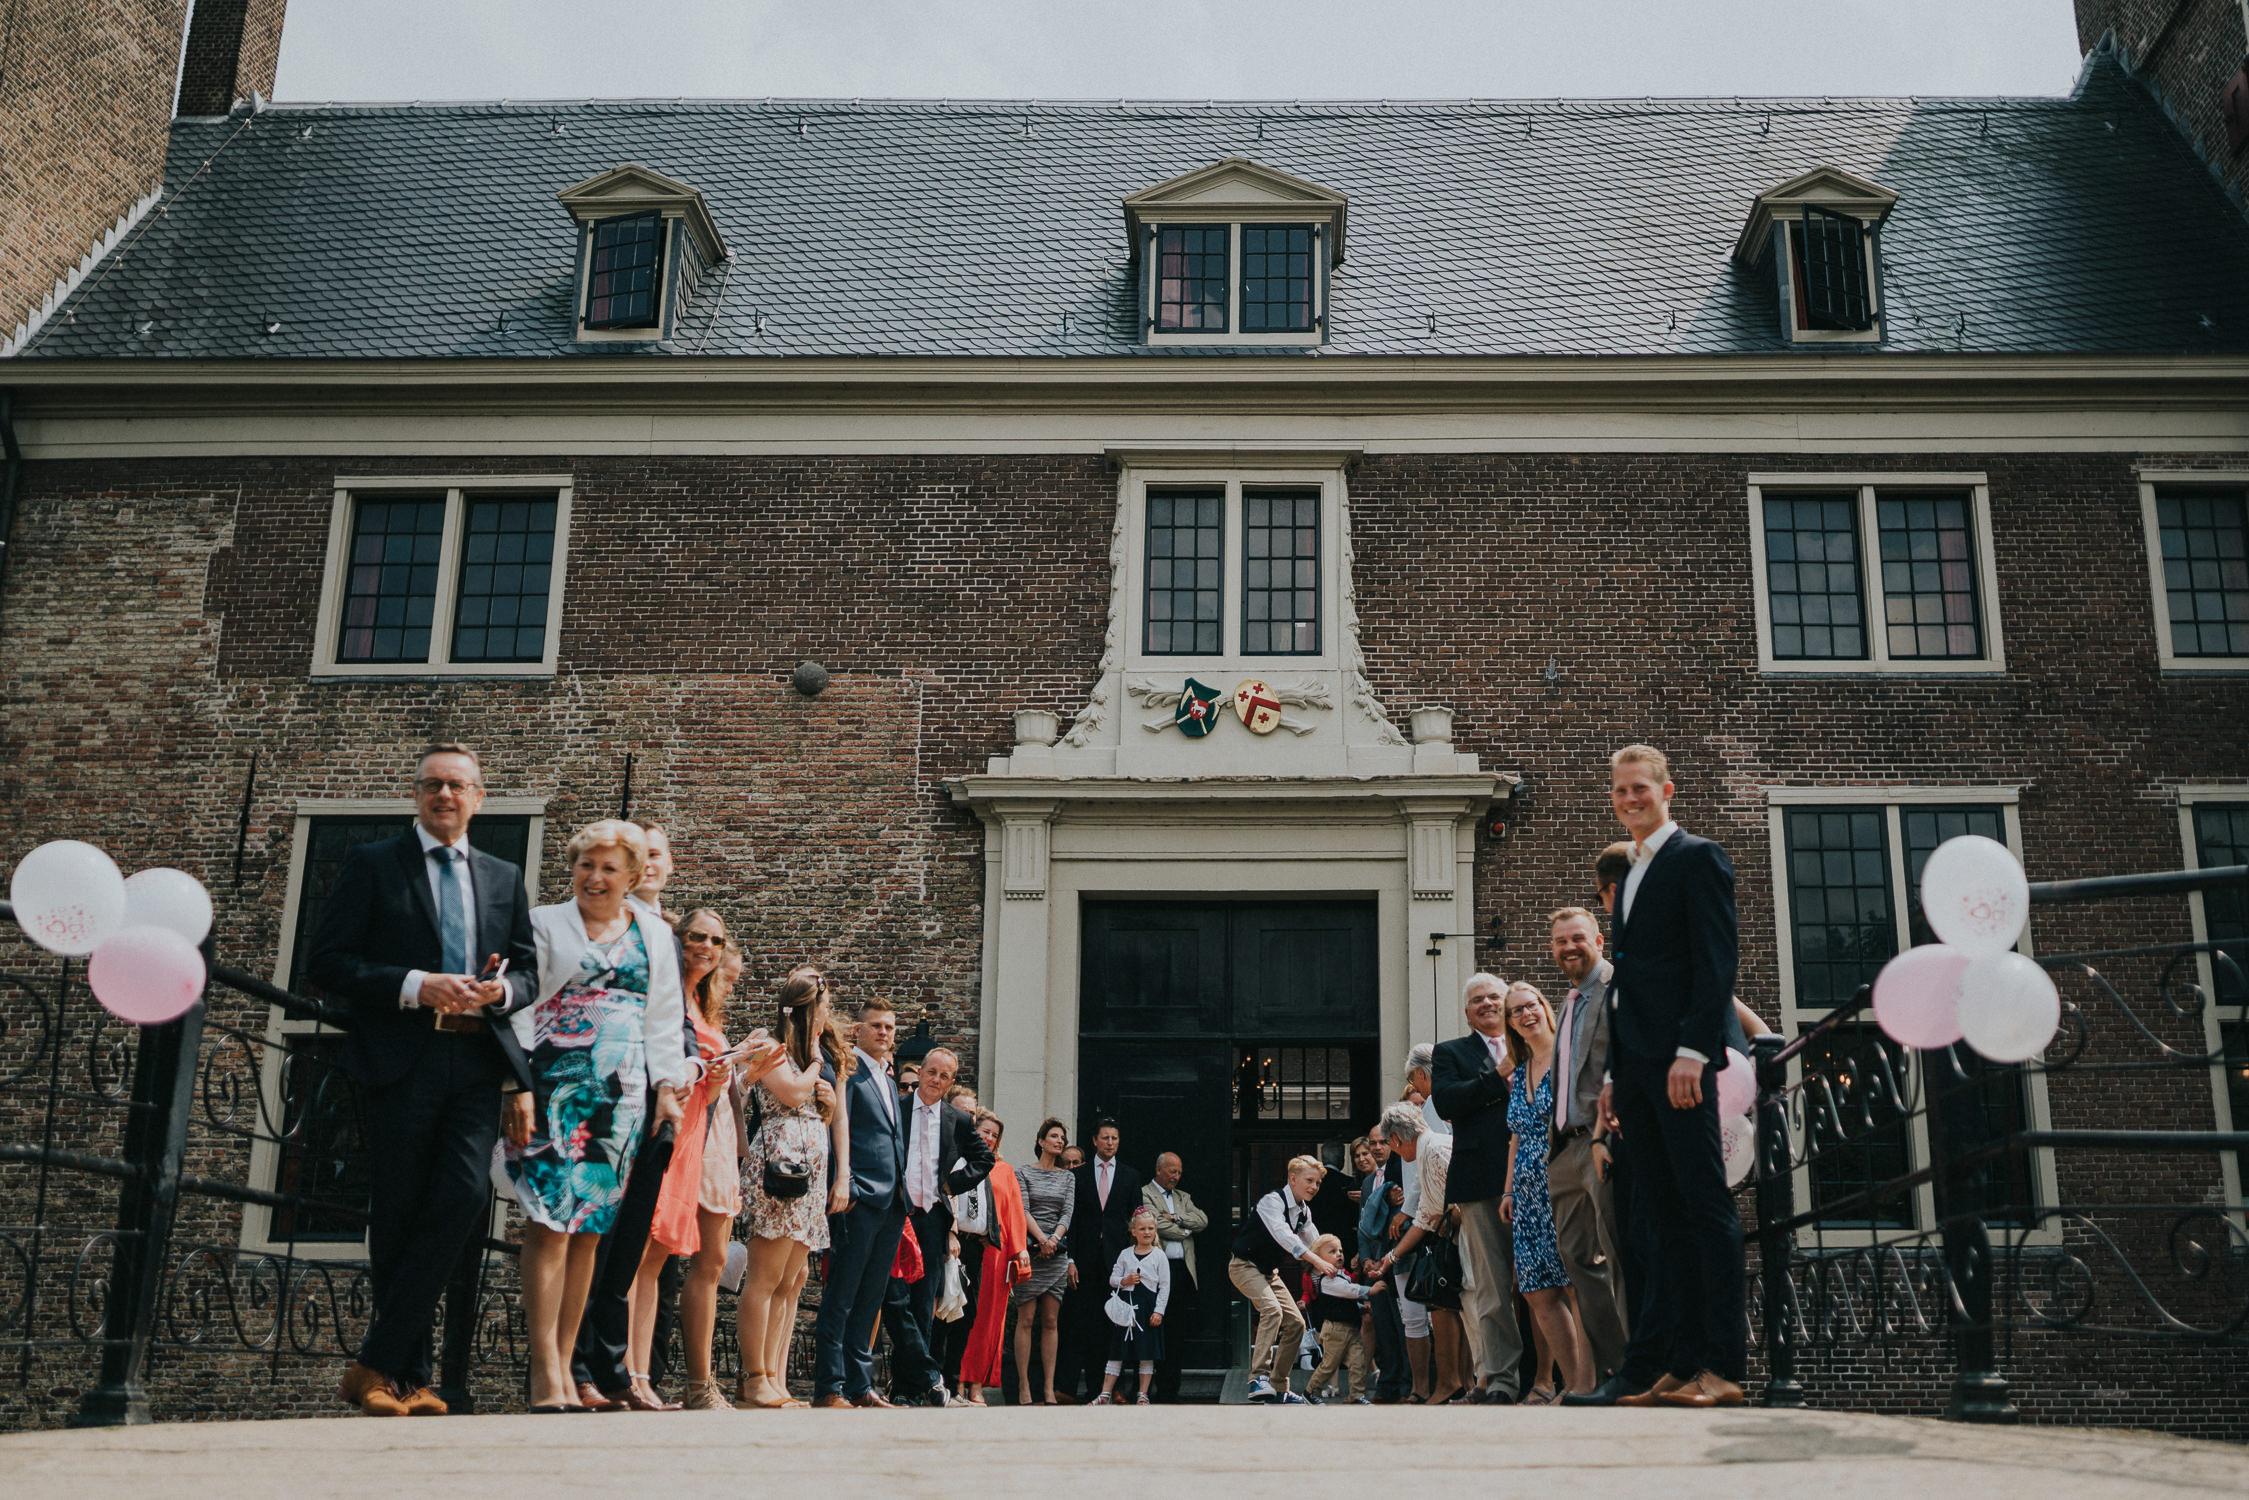 bruidsfotografie-amsterdam-utrecht-mark-hadden-wedding-photography-rowan-gideon-192.jpg